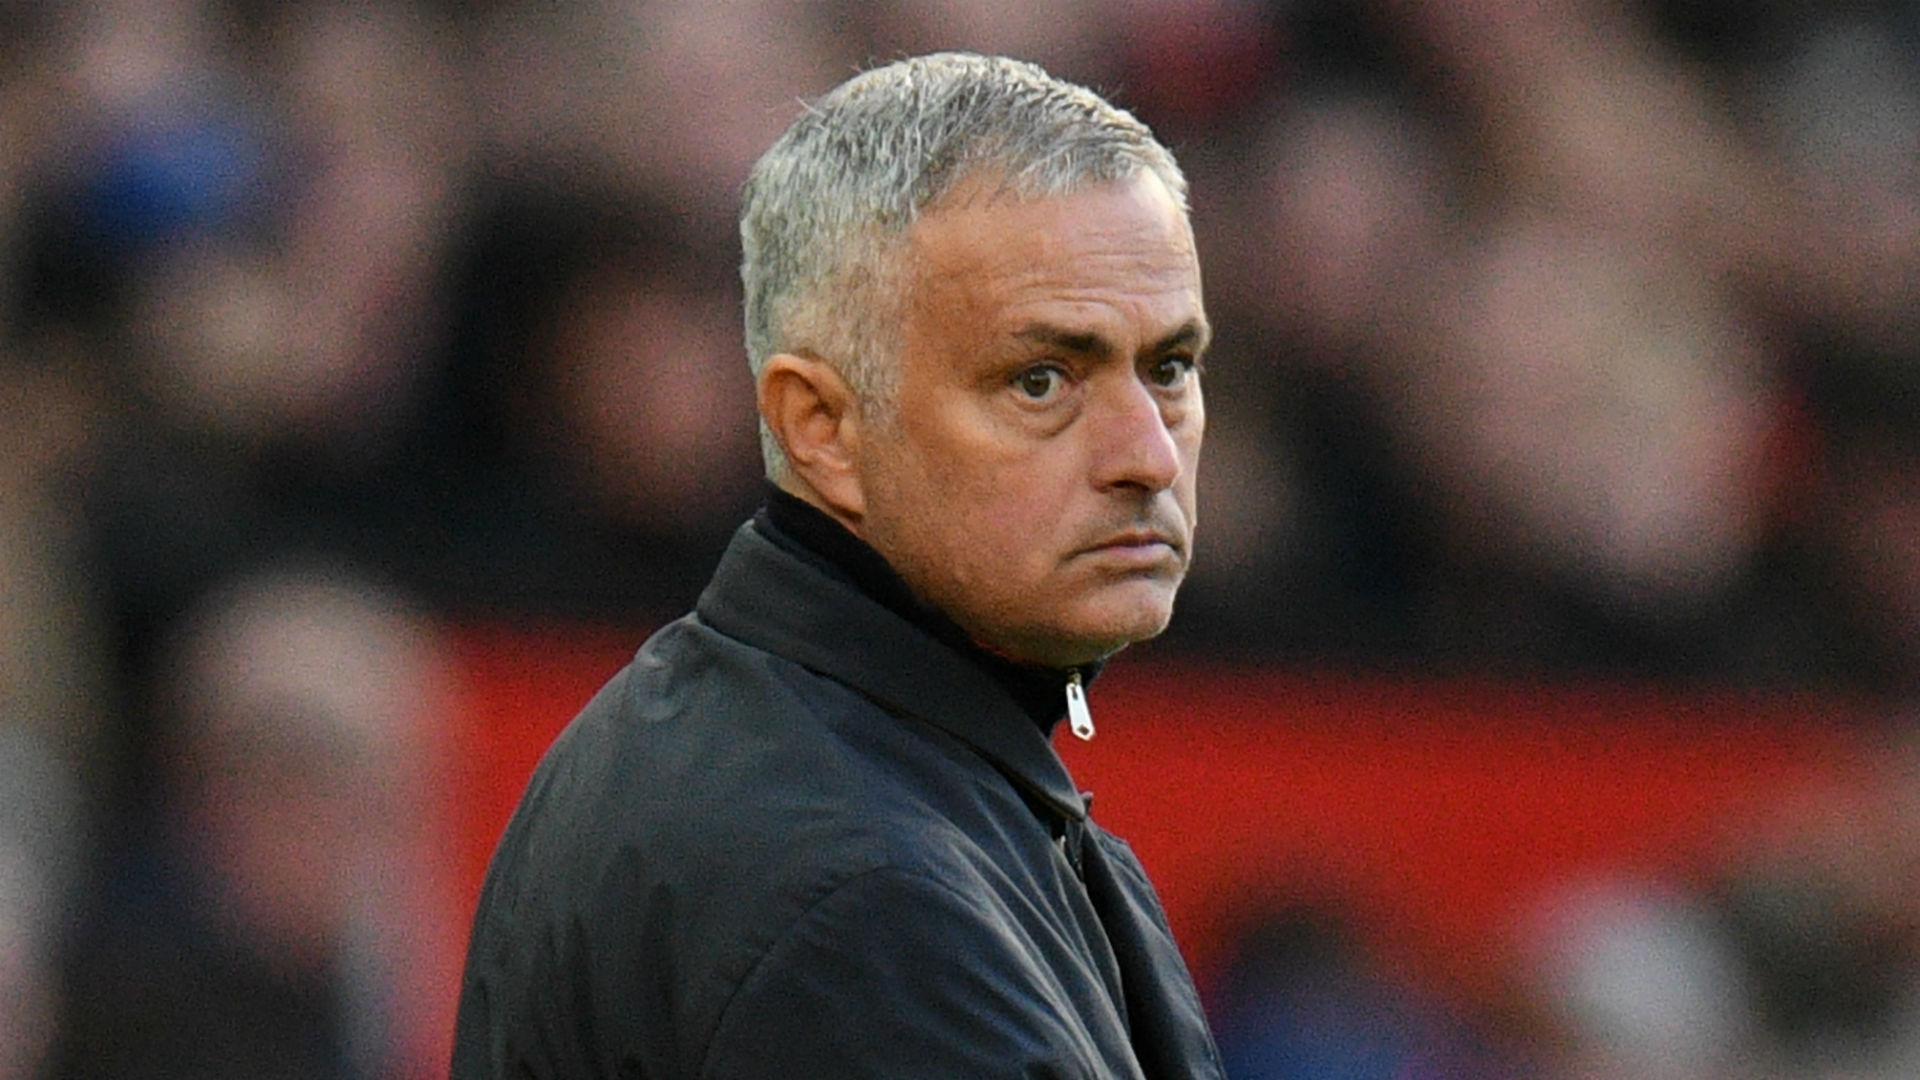 Jose-mourinho-man-utd-newcastle_1j4wpph2e41nd1t6eowtq82bgu